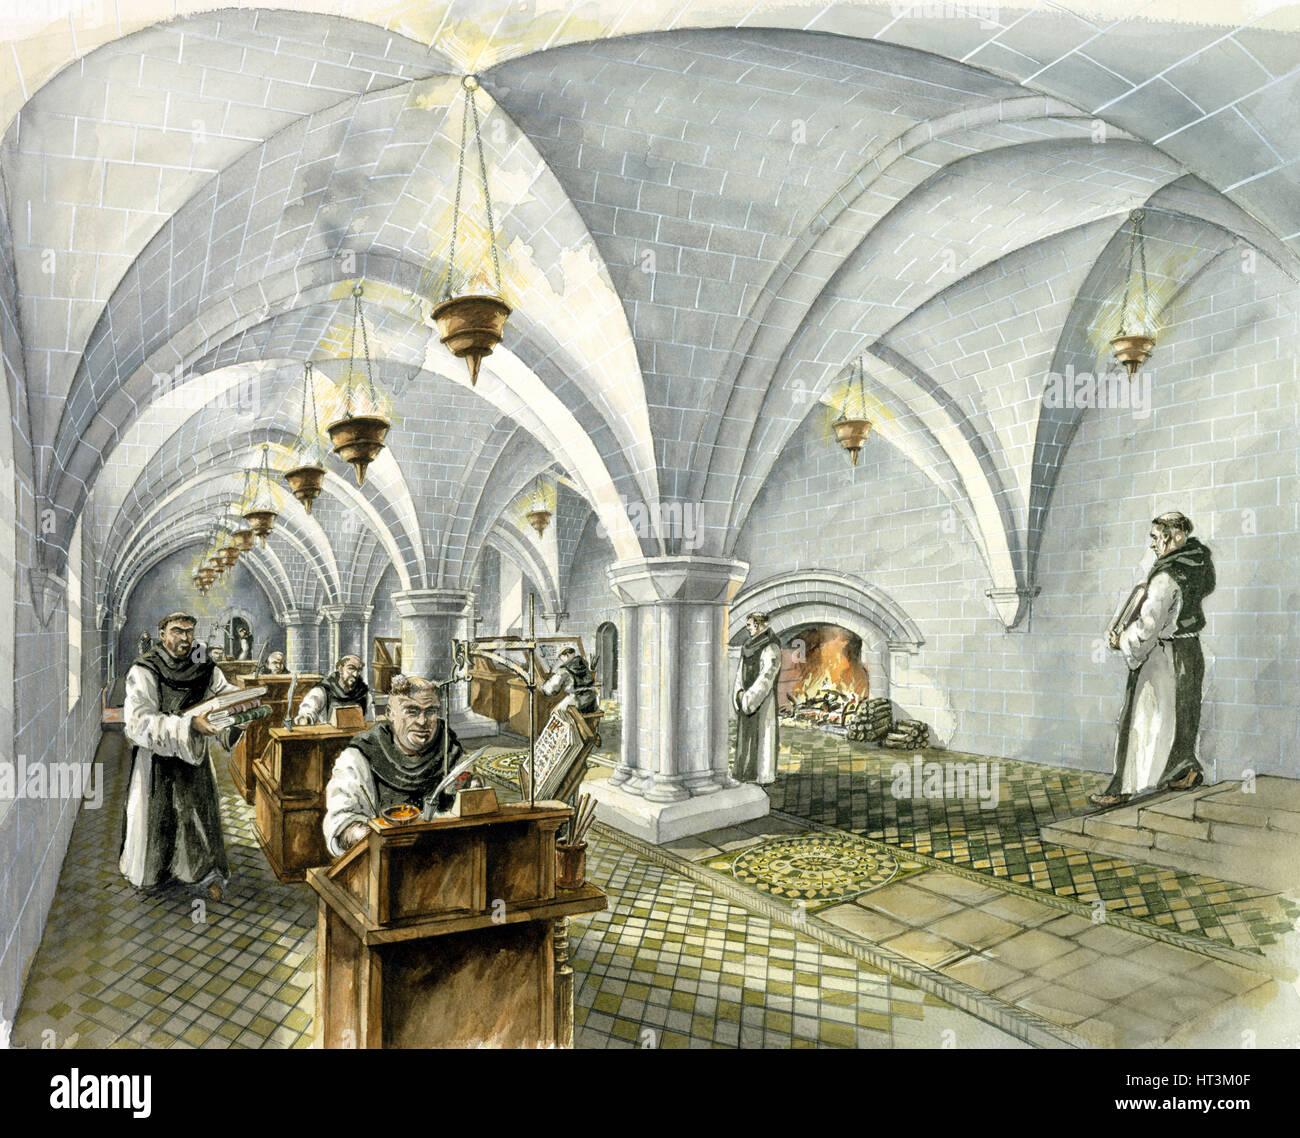 Rievaulx Abbey, 13th century, (c1990-2010). Artist: Peter Dunn. - Stock Image